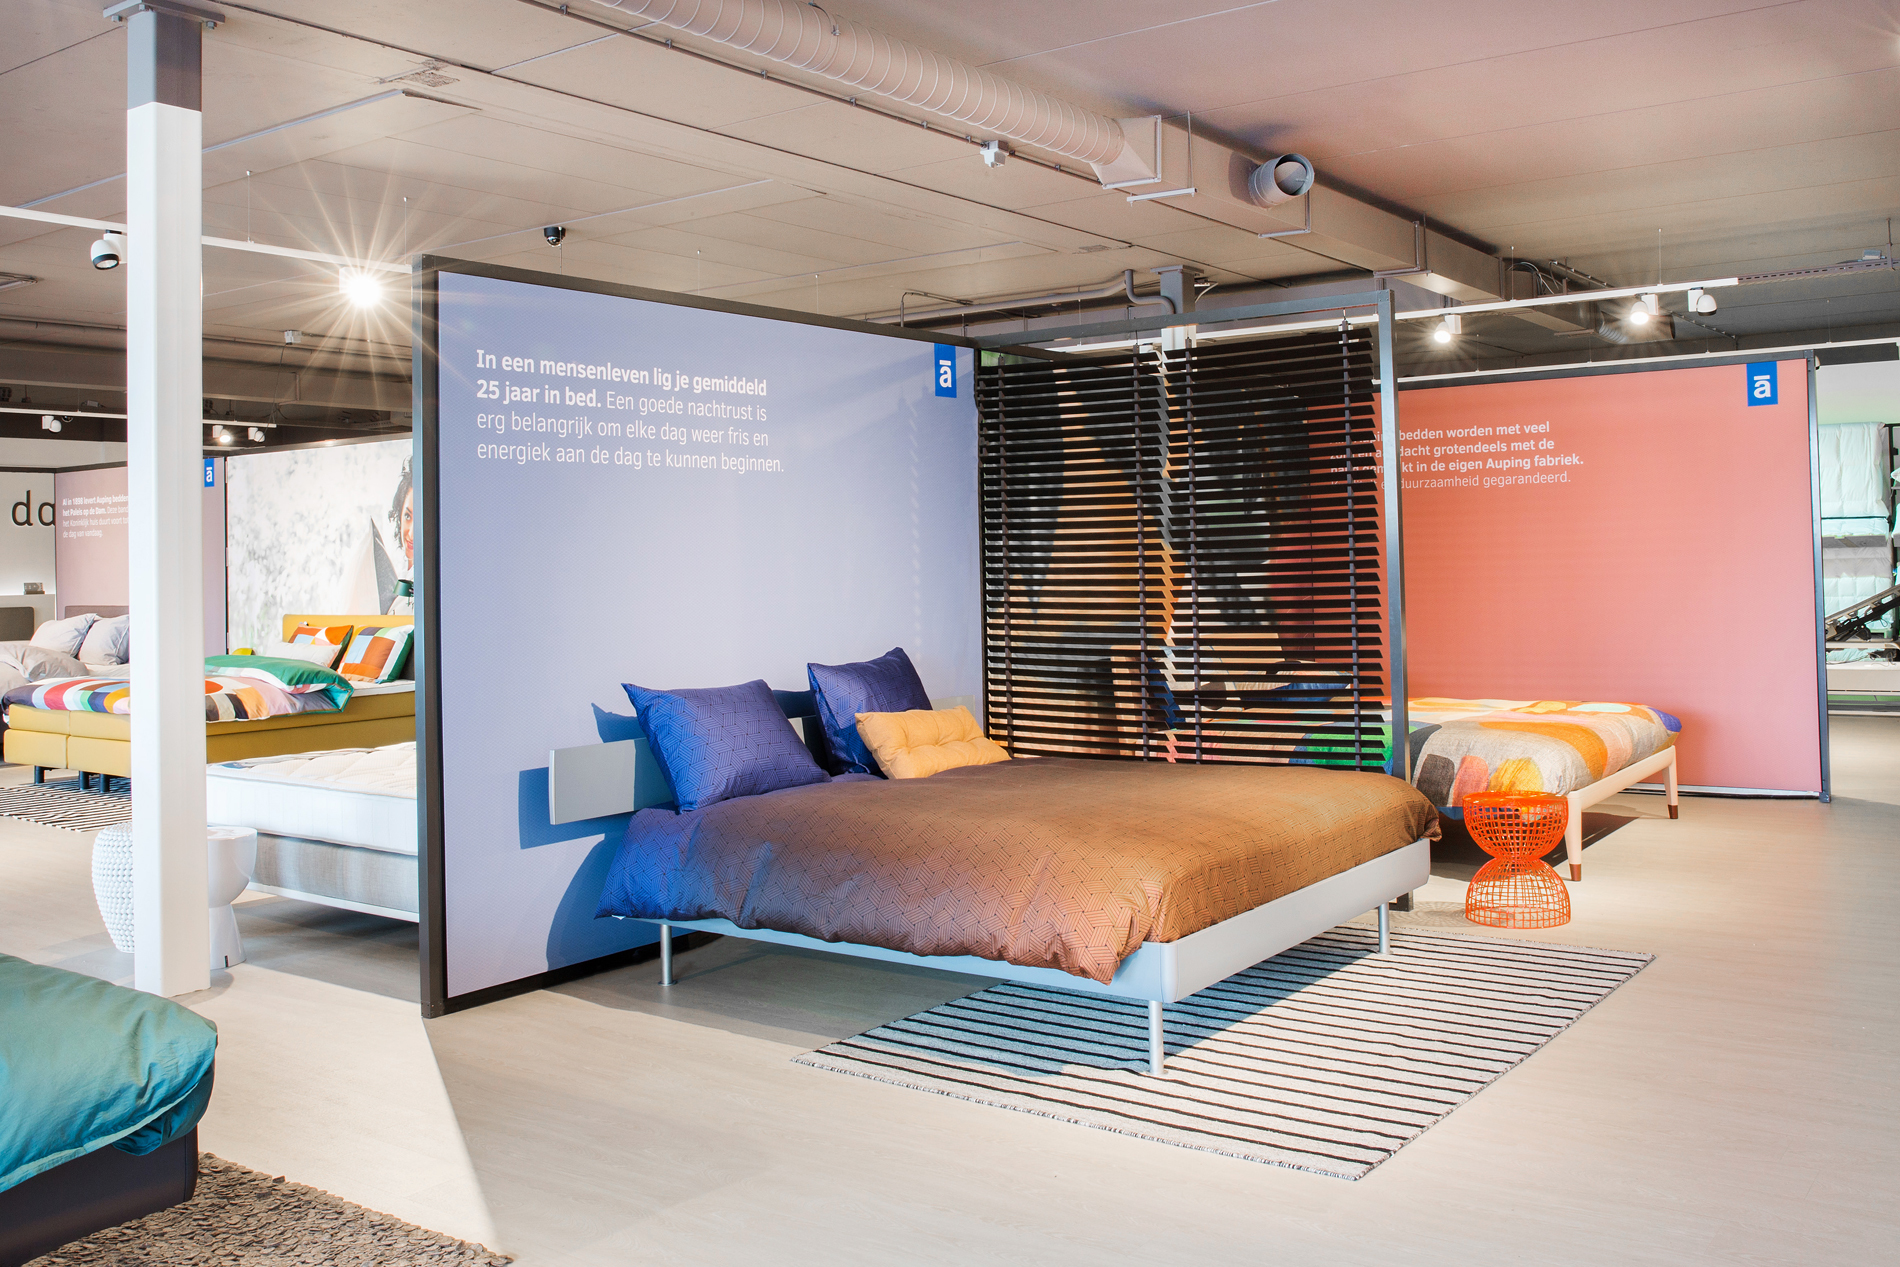 Auping Plaza Nijmegen – Natural Talalay Latex Mattress and Latex Pillow Store in Nijmegen GE